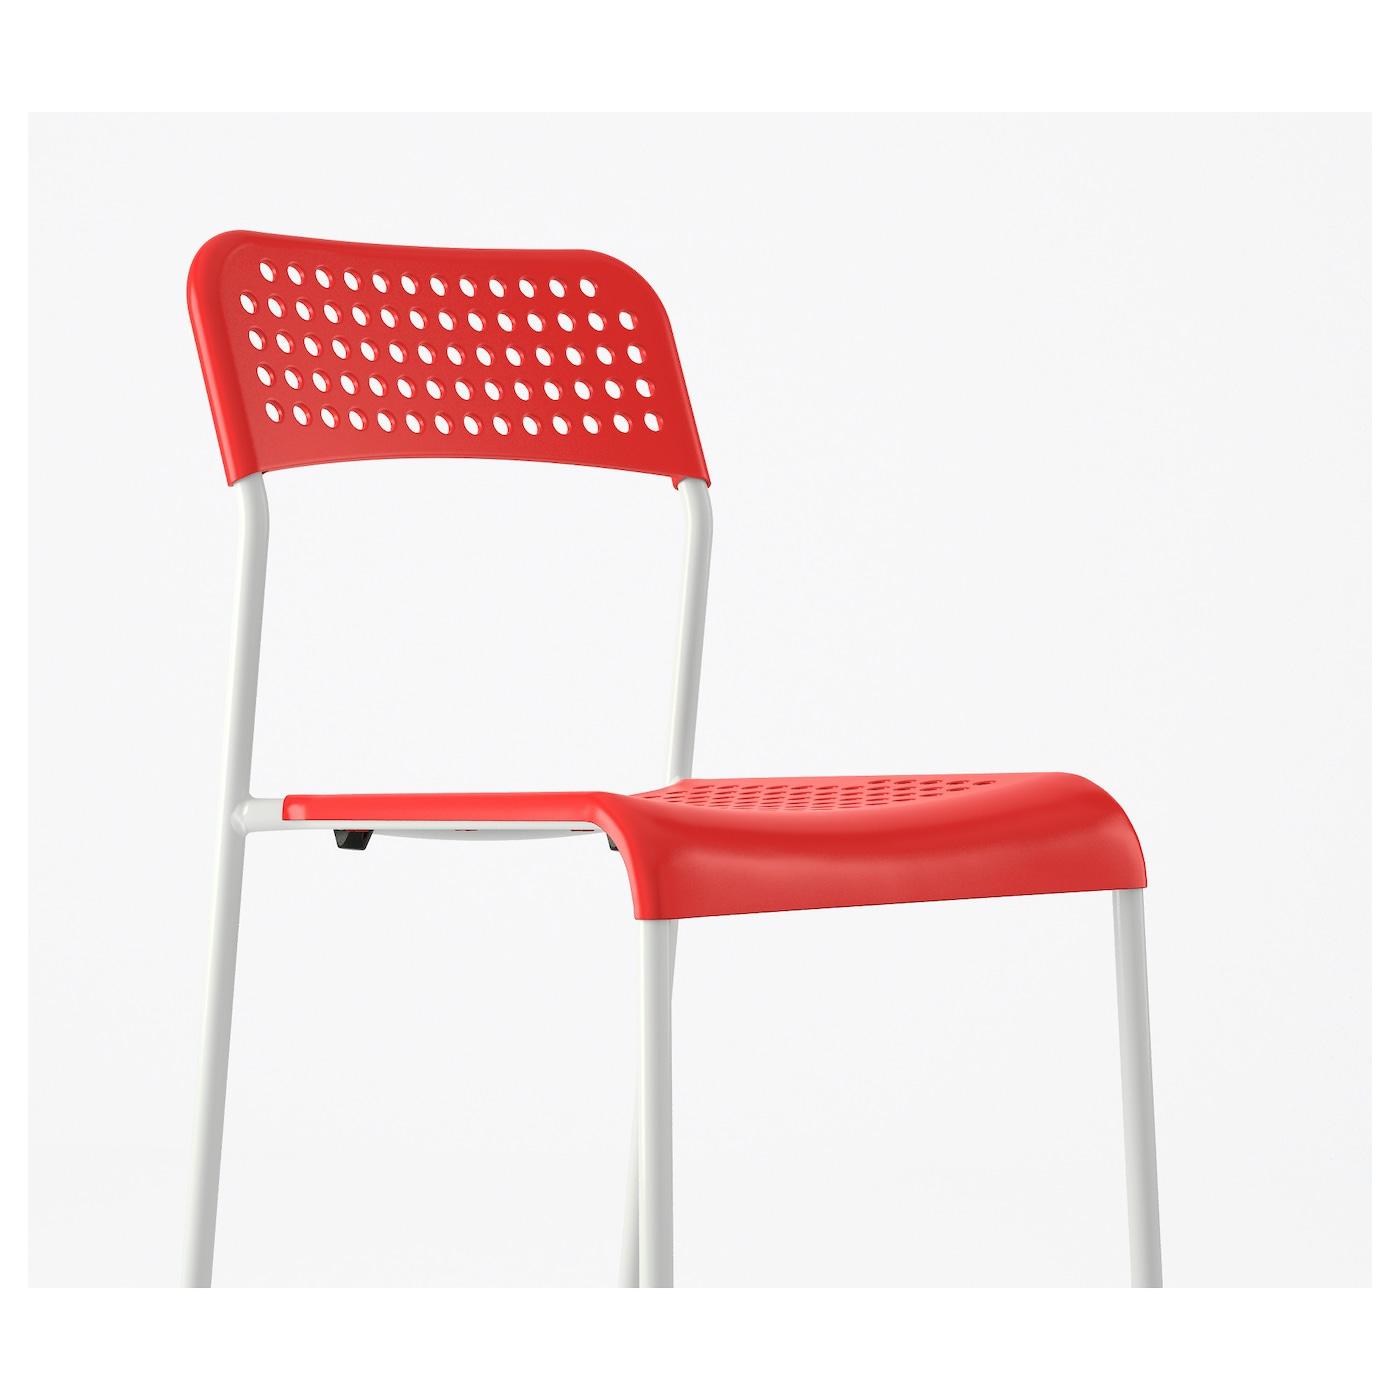 ADDE Chair Red white IKEA